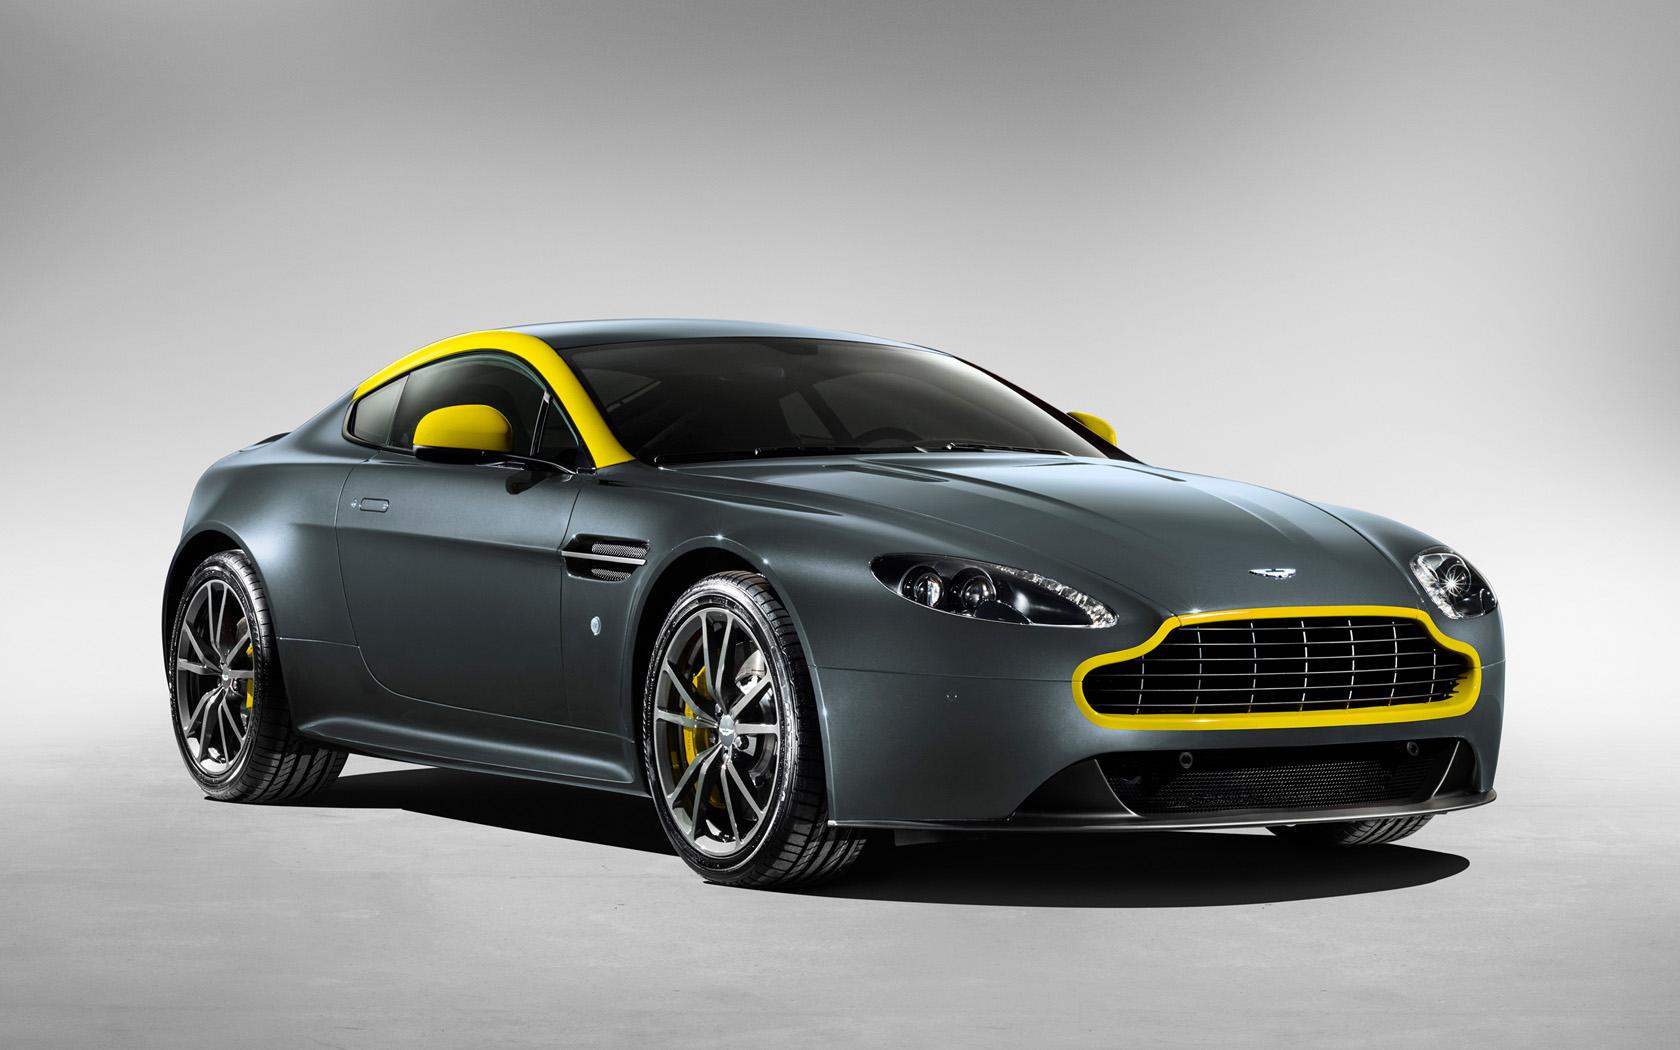 2014 Model Aston Martin V8 Vantage N430